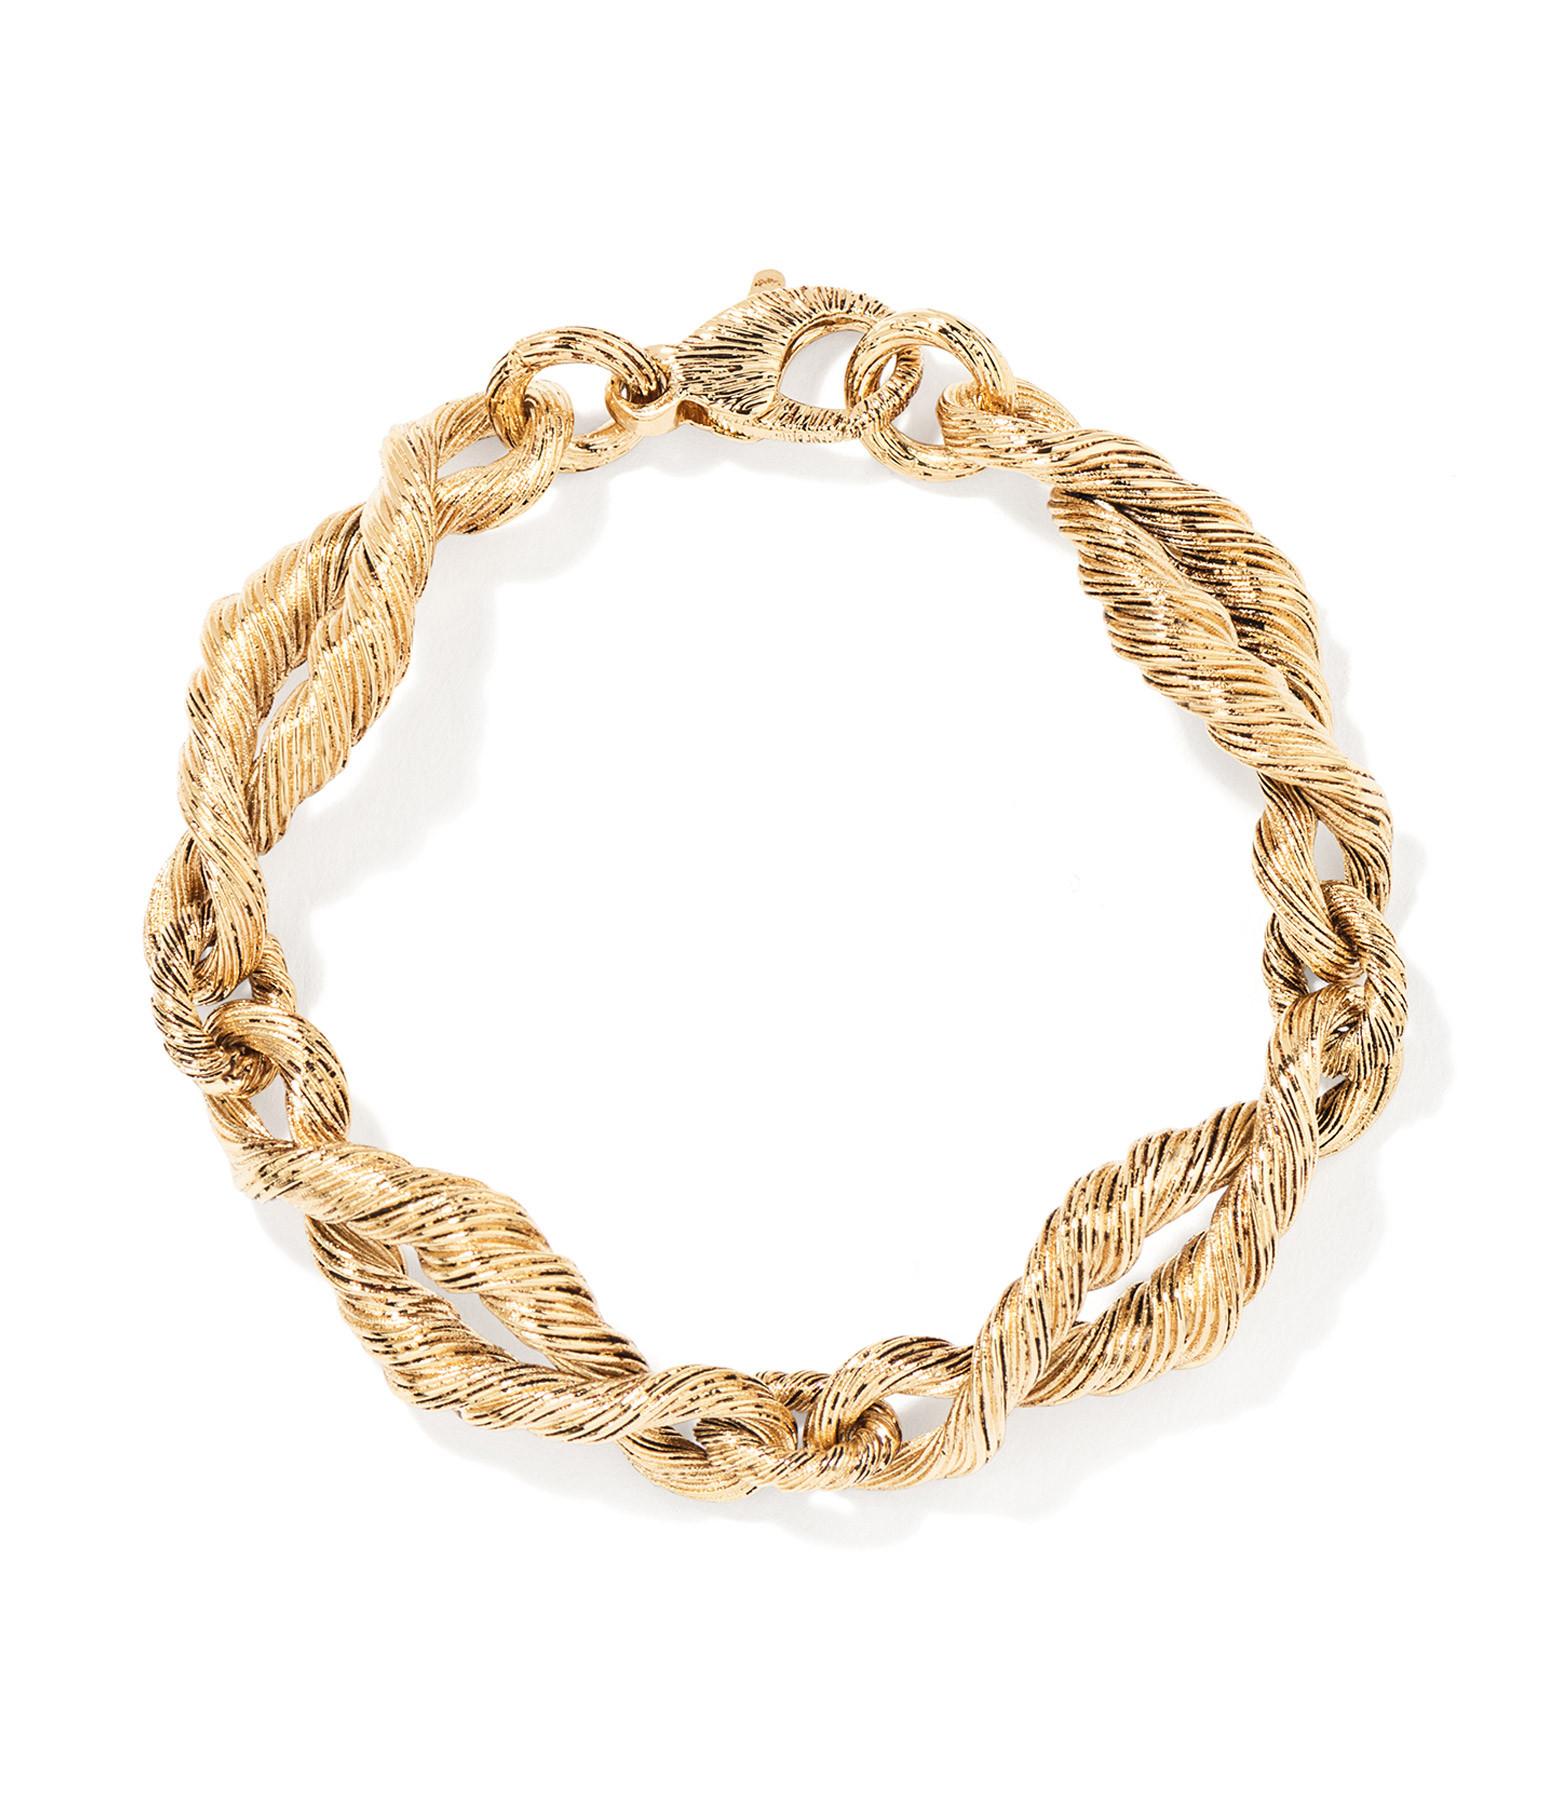 AURELIE BIDERMANN - Bracelet Lola Plaqué Or Jaune